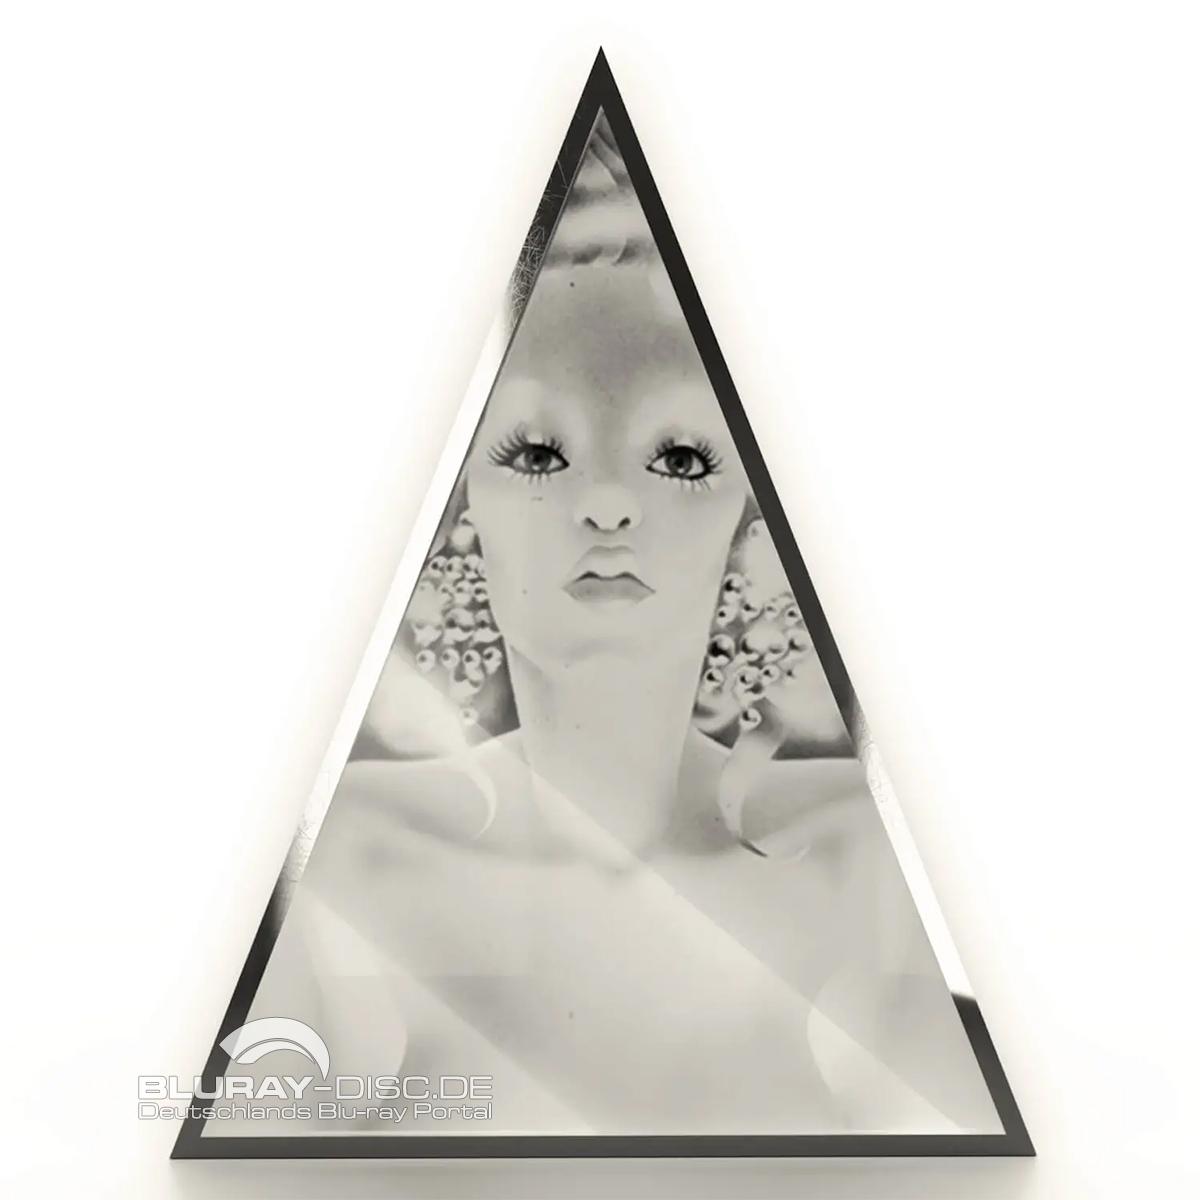 Uhrwerk_Orange_Galerie_4K_Titans_of_Cult_04.jpg